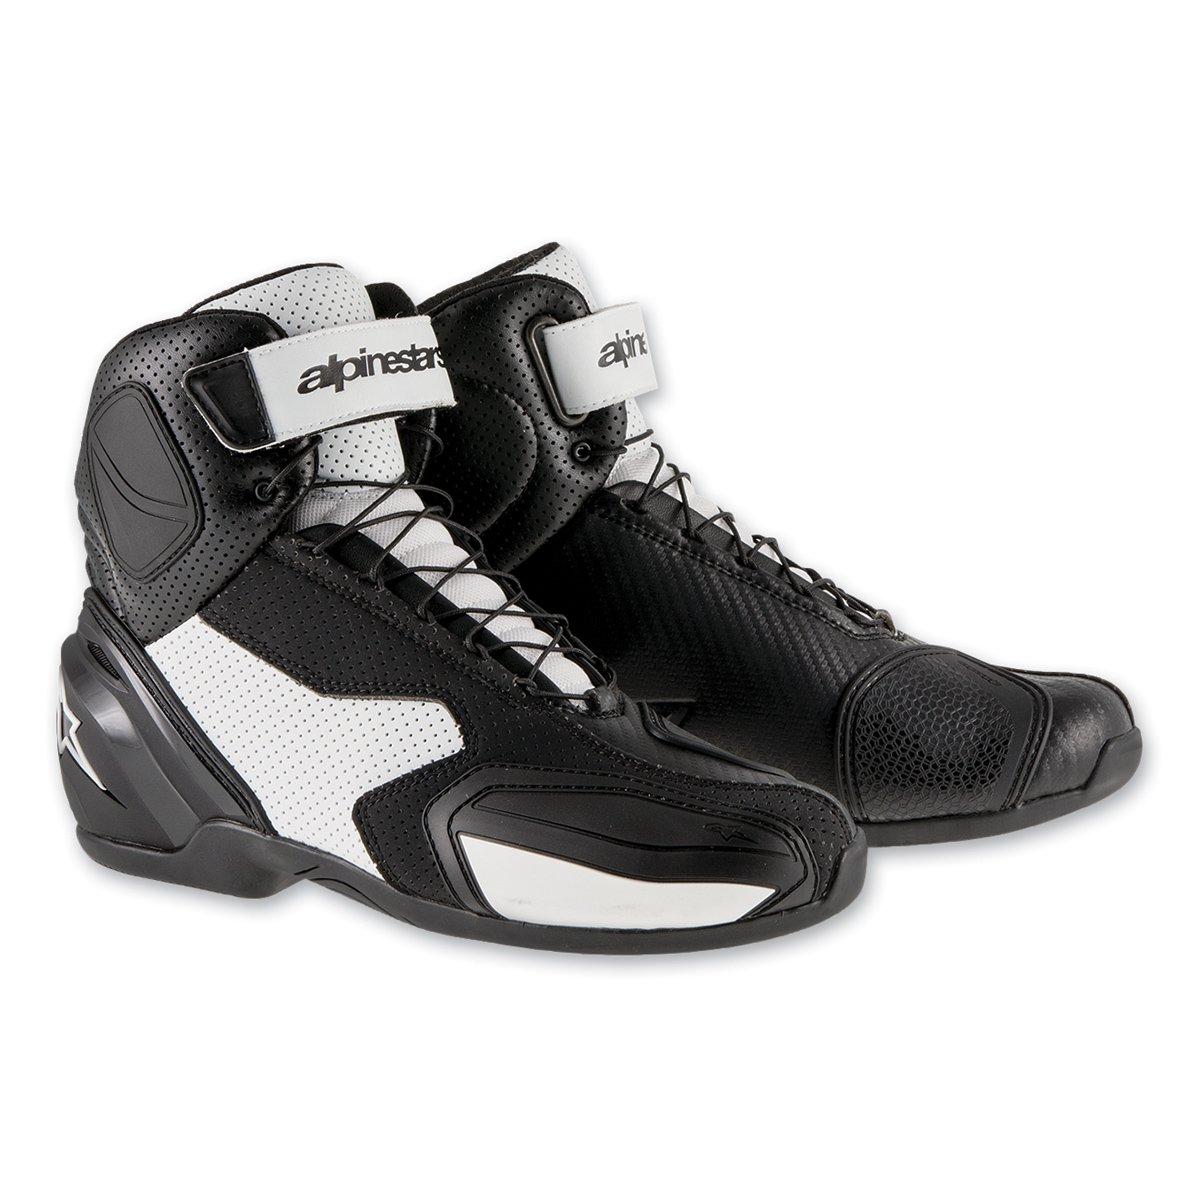 Alpinestars sp-1 Vented Shoes B0156WA72M Euro 38 ブラック/ホワイト ブラック/ホワイト Euro 38